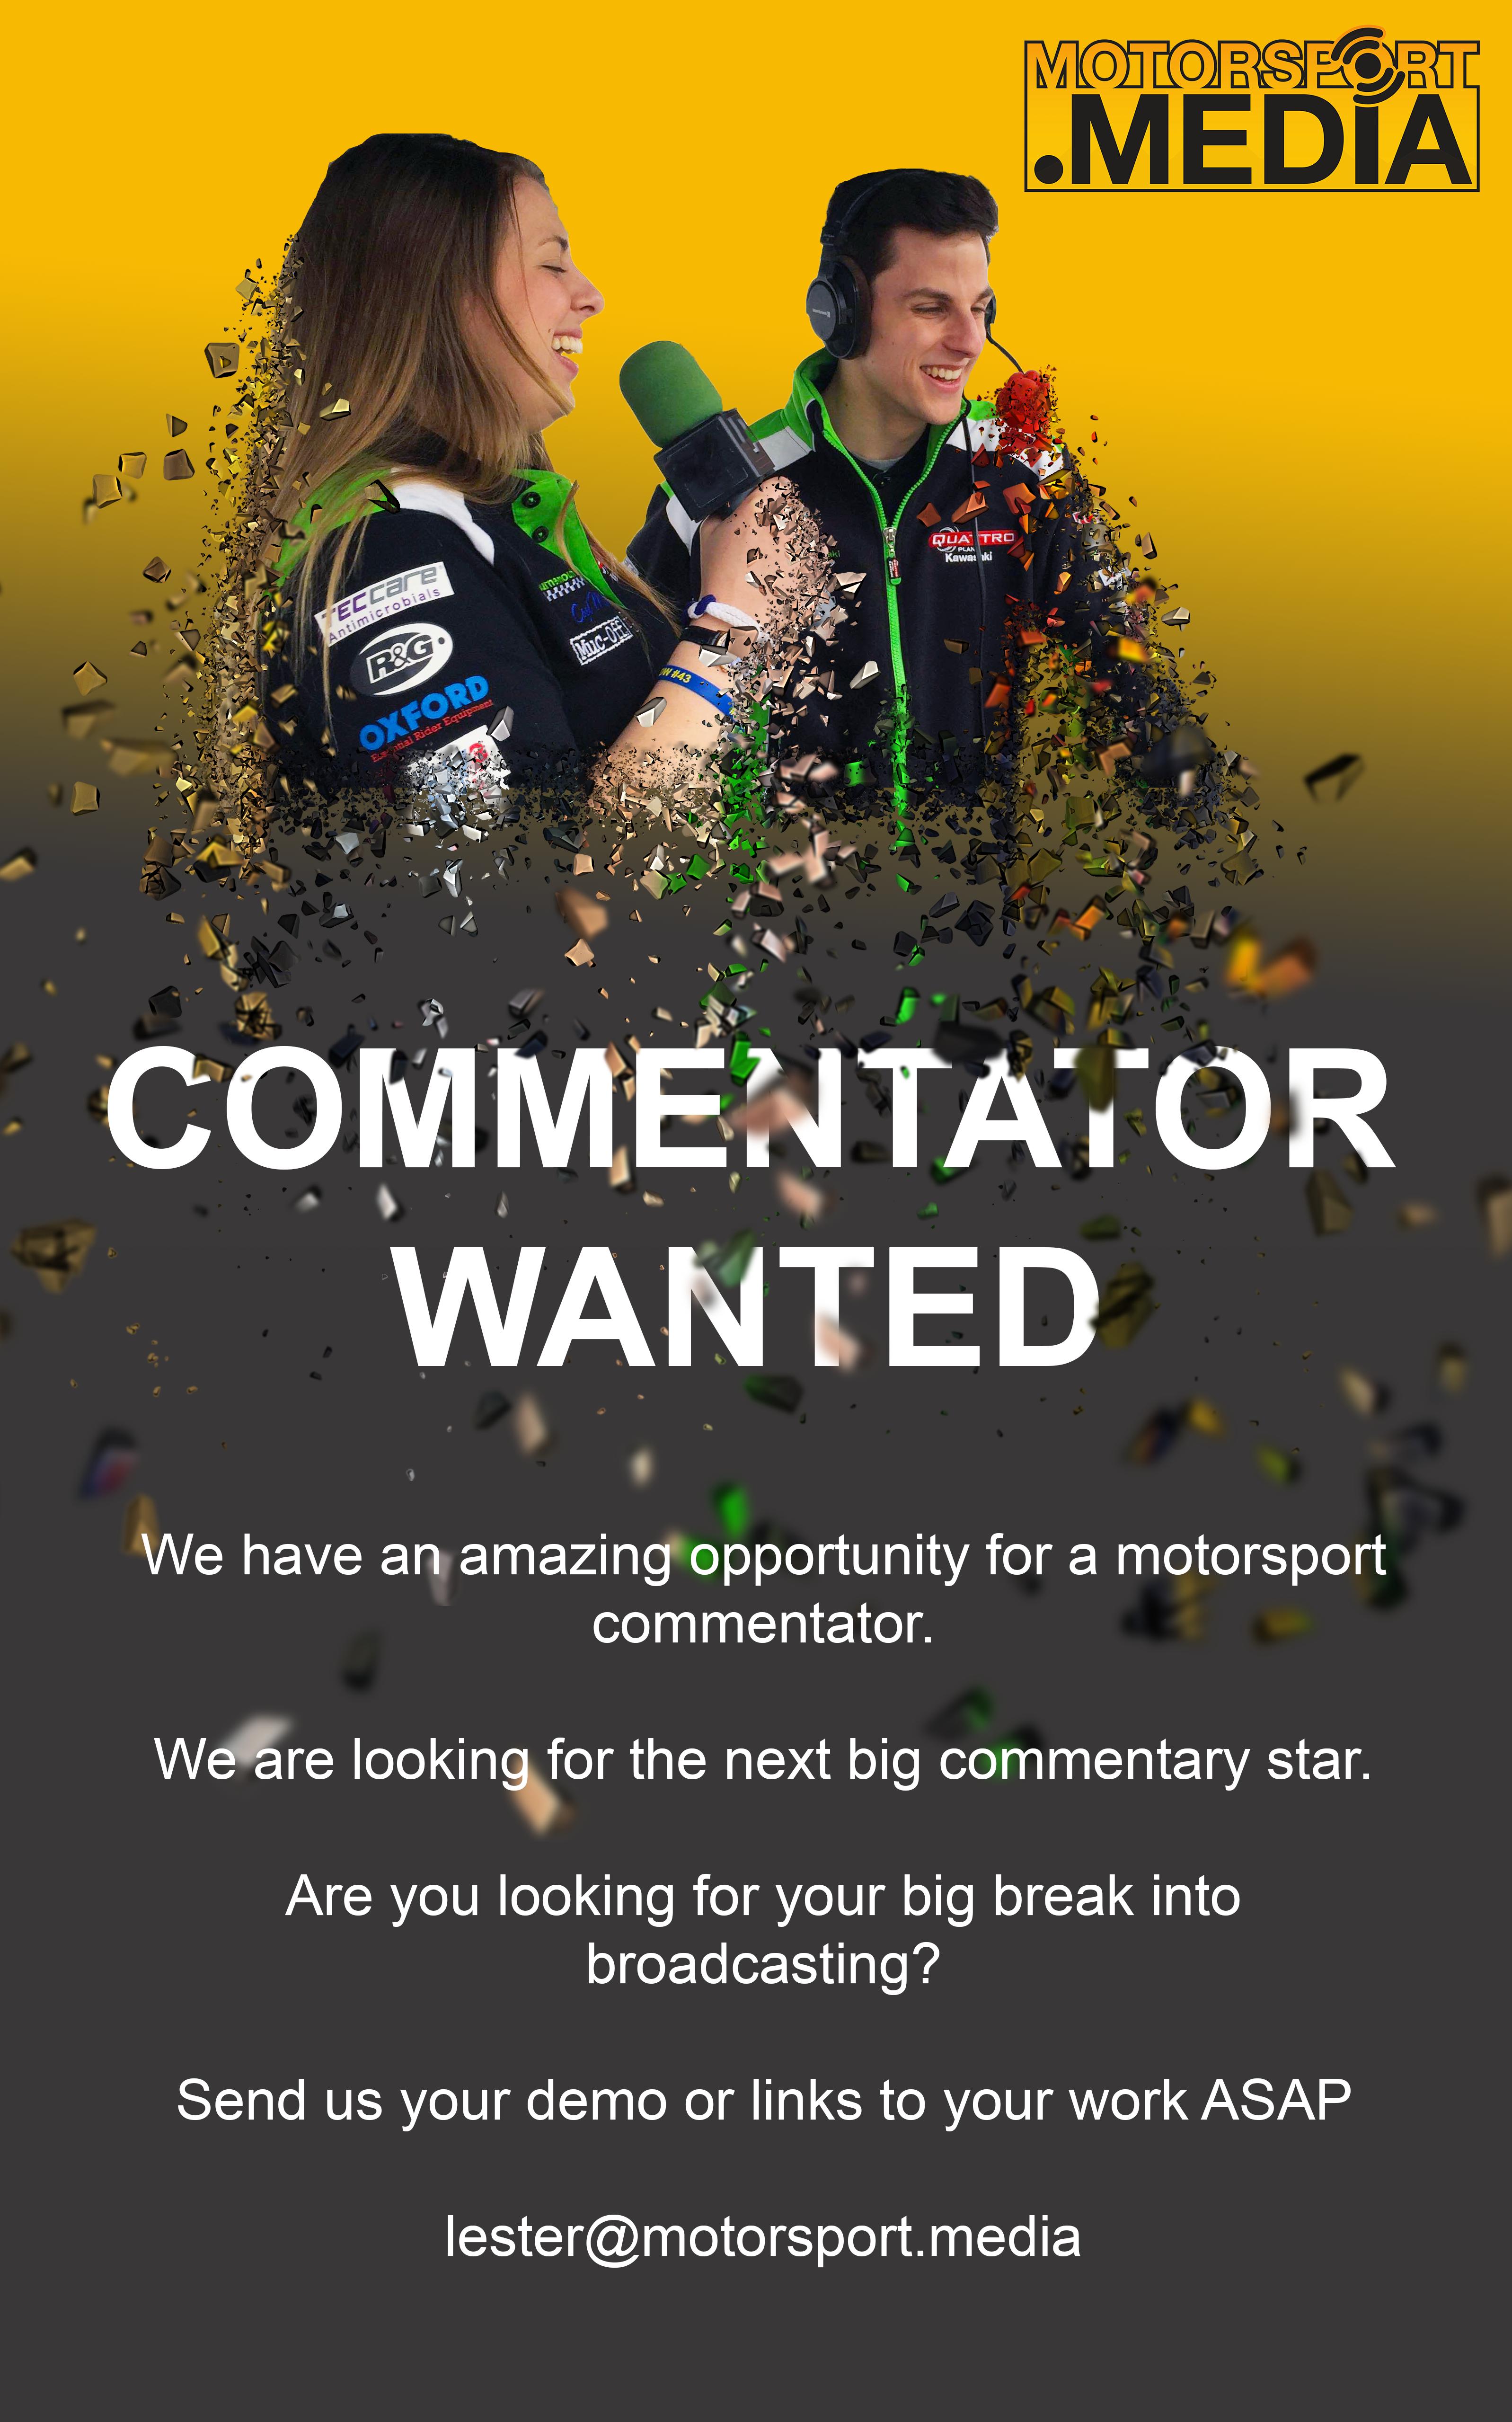 https://motorsport.media/wp-content/uploads/2017/02/advert-final.png